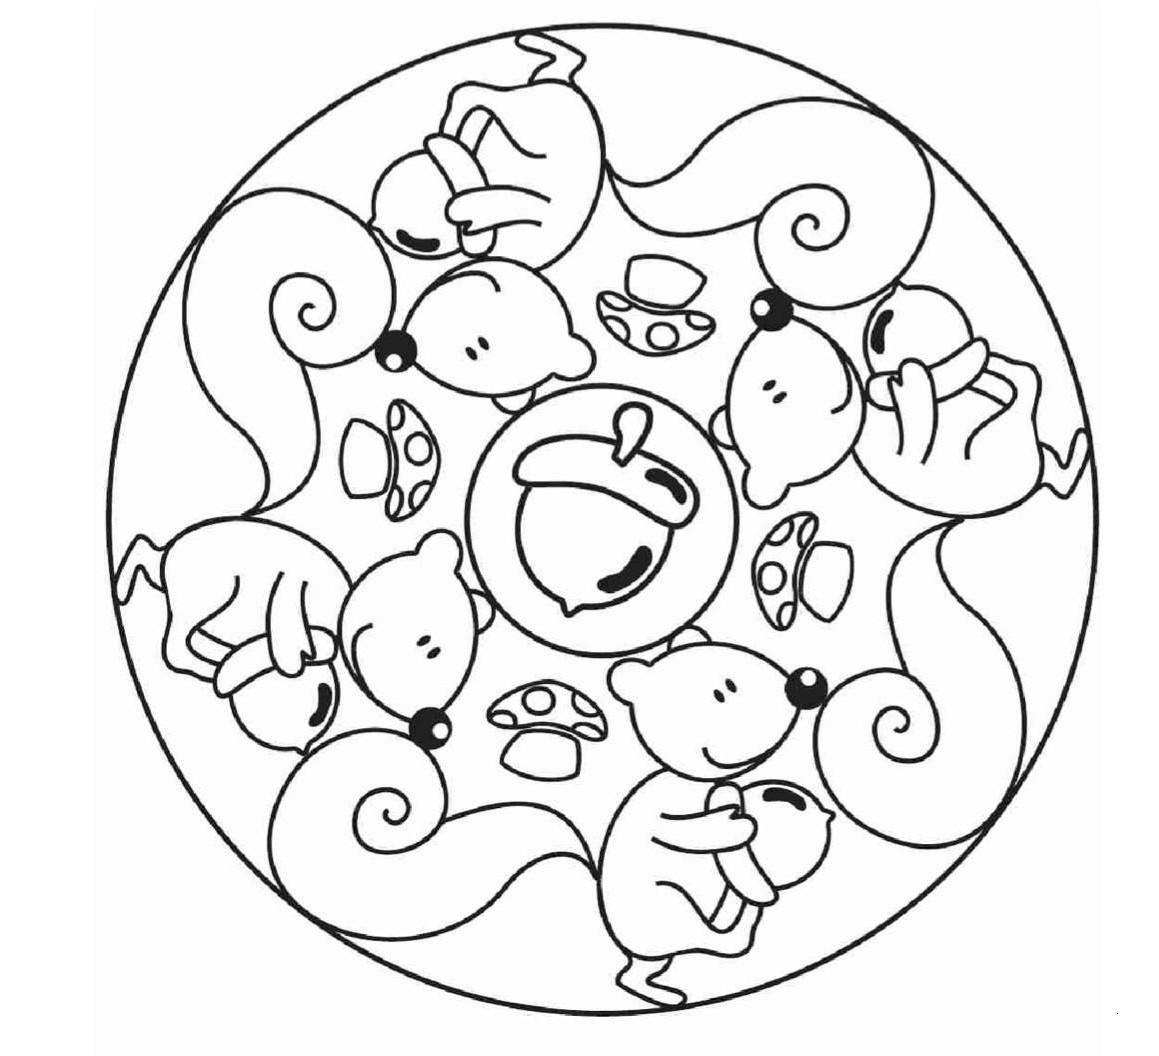 Mandala Herbst Zum Ausdrucken Genial 34 Elegant Malvorlagen Mandala – Malvorlagen Ideen Stock